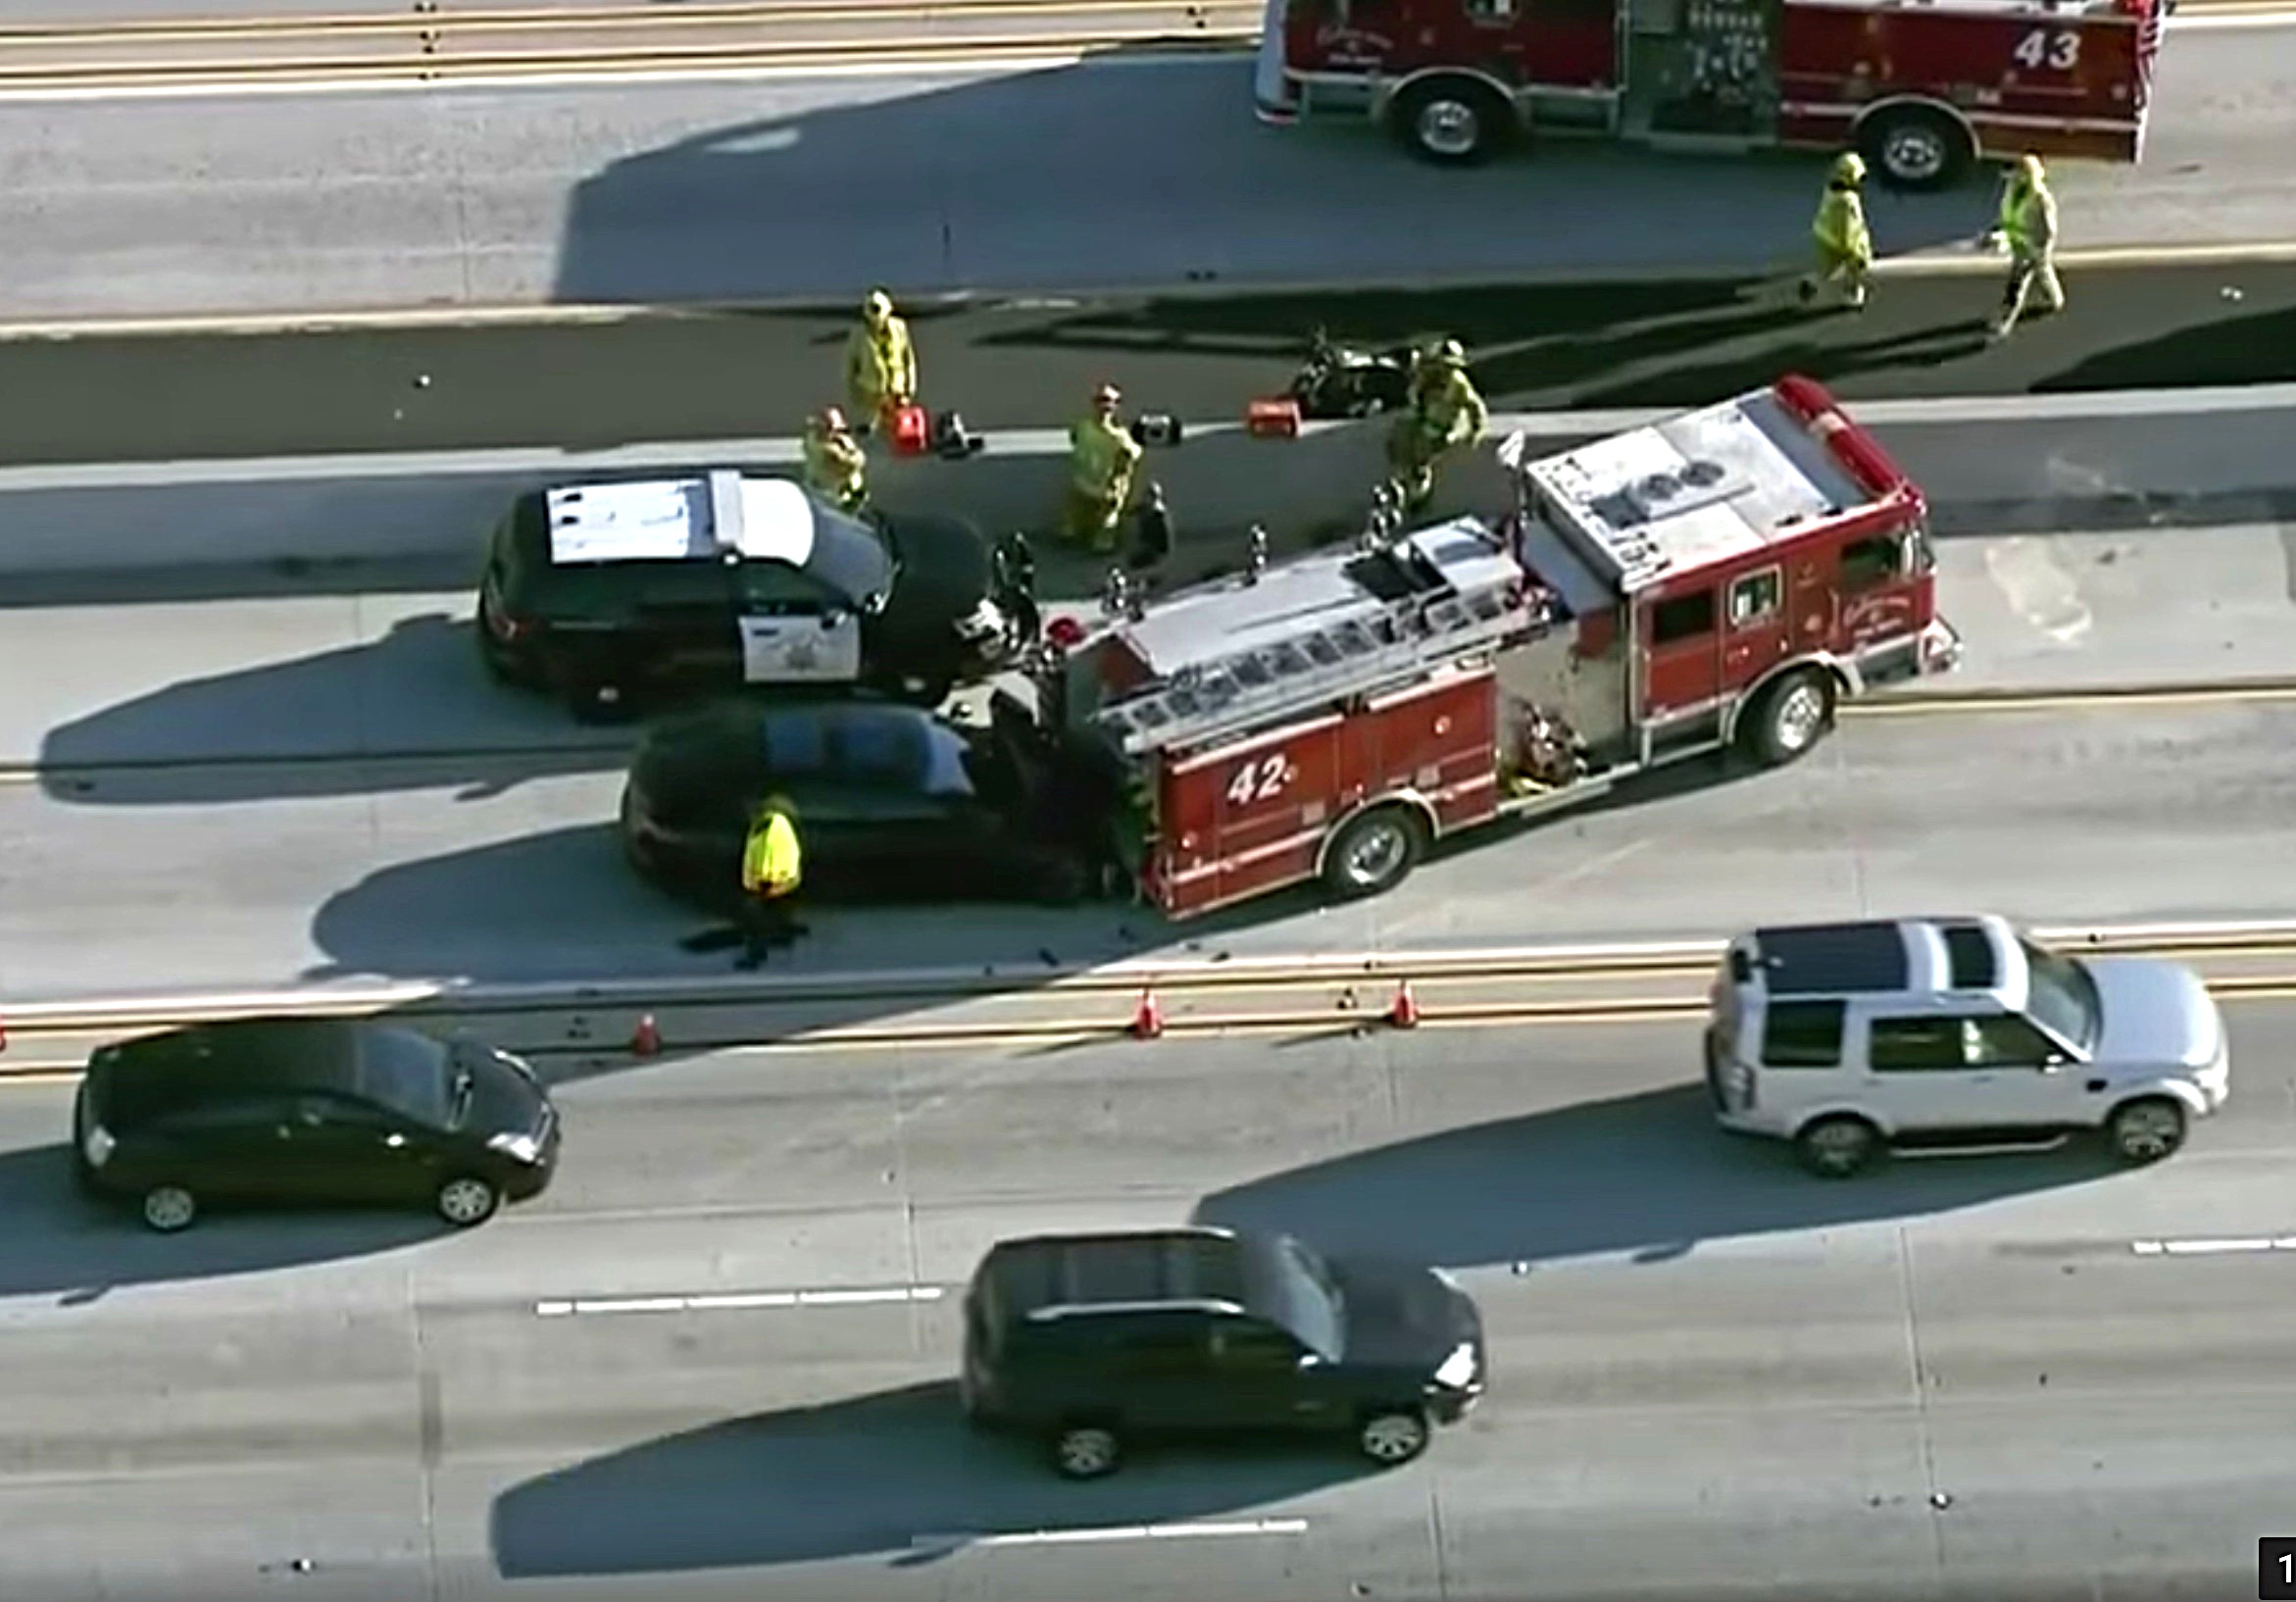 tesla-crash-fire-truck-405-los-angeles